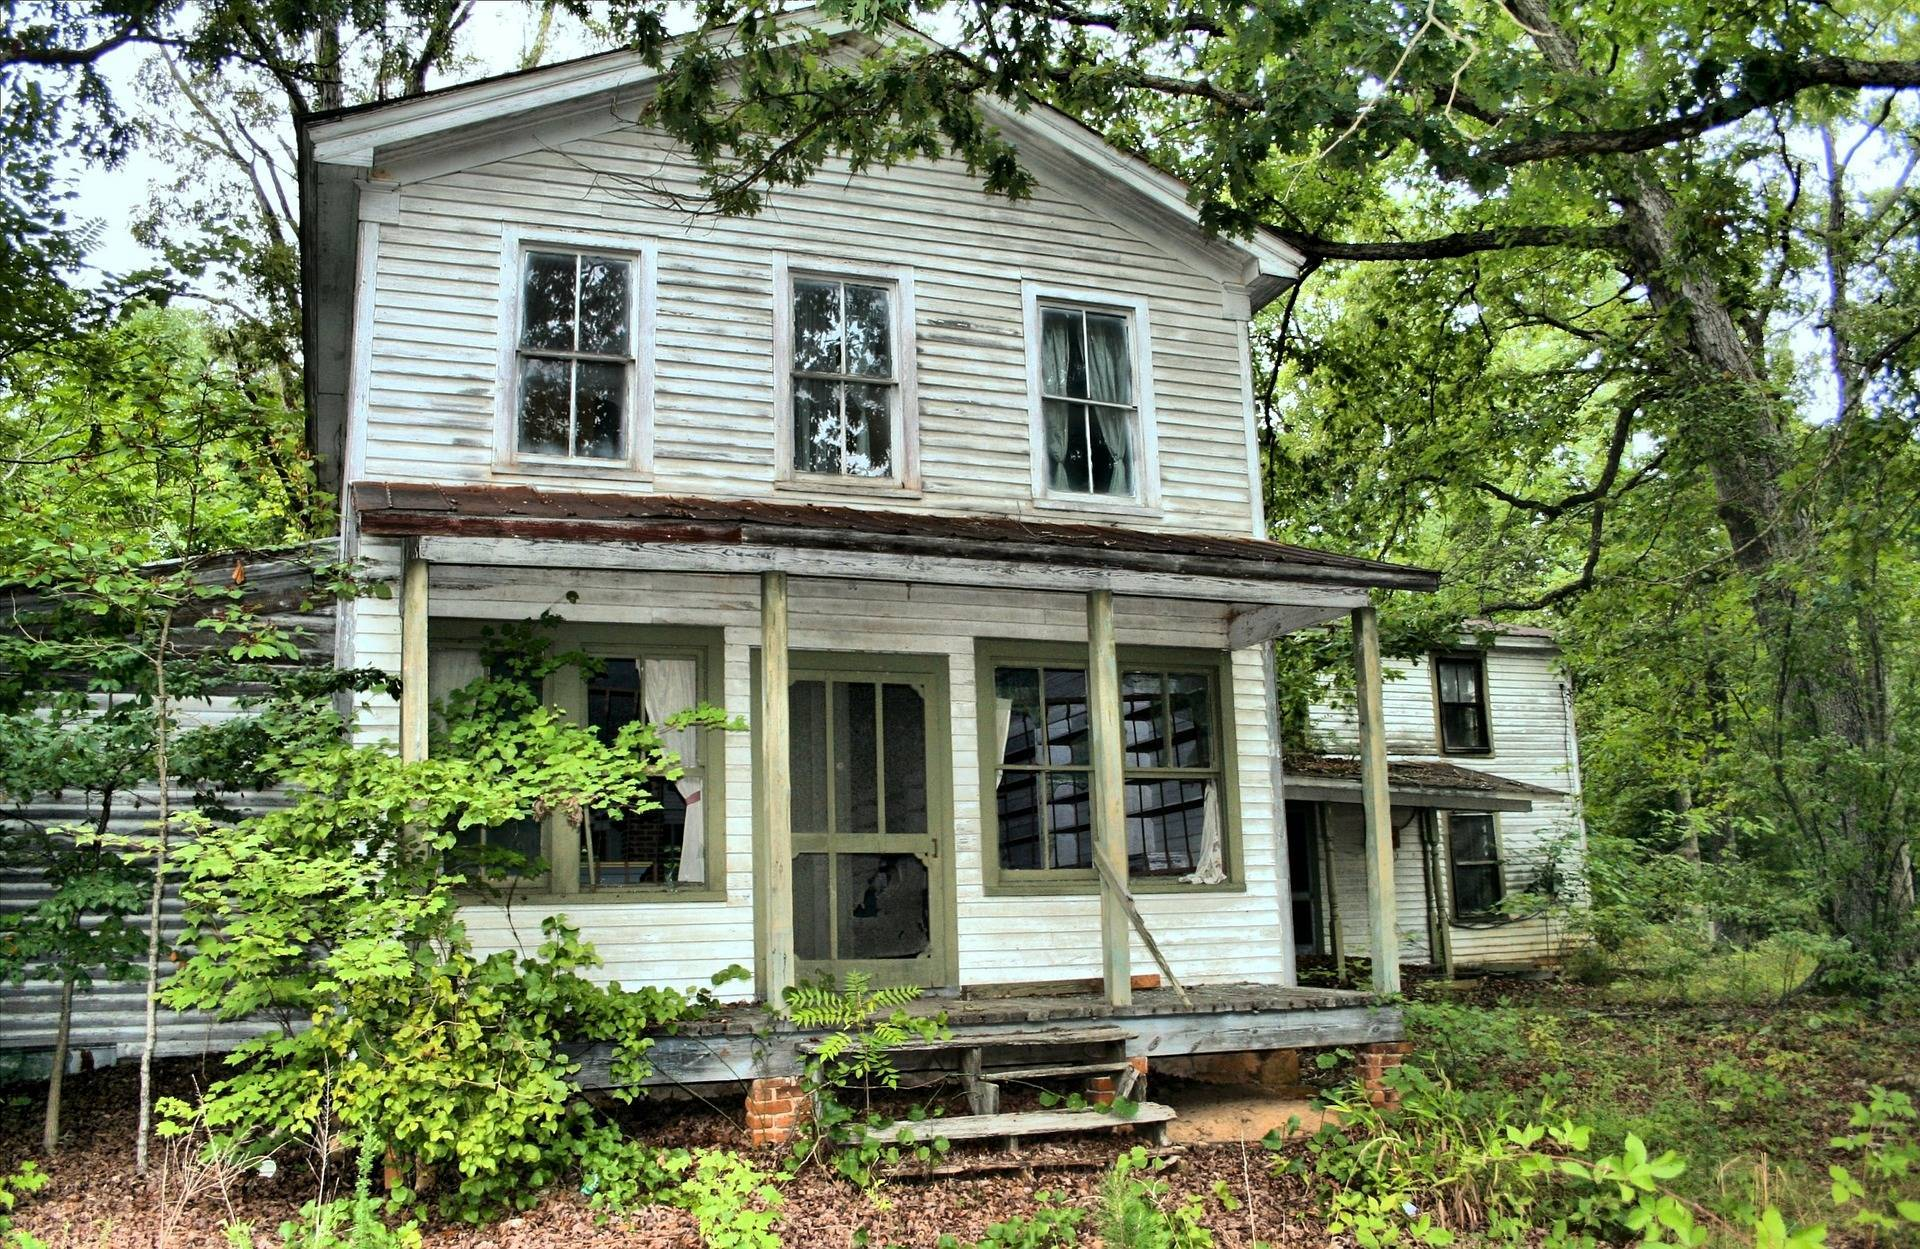 6245bab556355cdabe7e_foreclosure_house-54570_1920.jpg